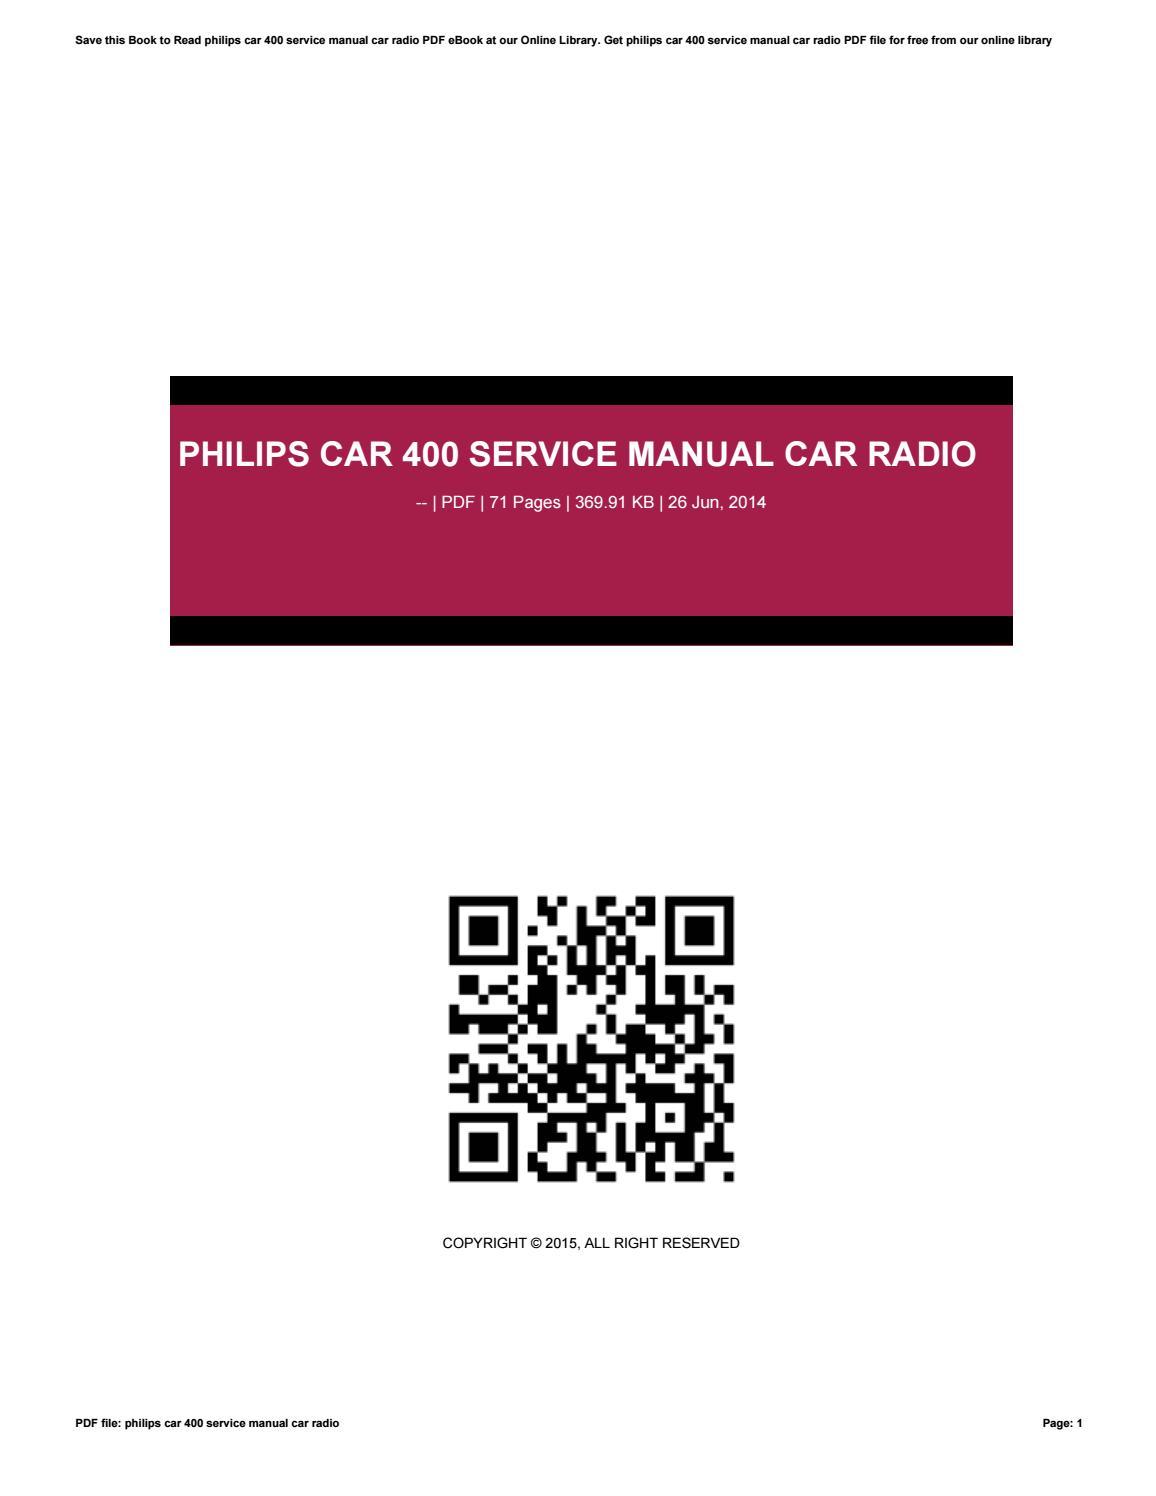 Free auto service manuals online array philips car 400 service manual car radio by glubex79 issuu rh issuu fandeluxe Gallery